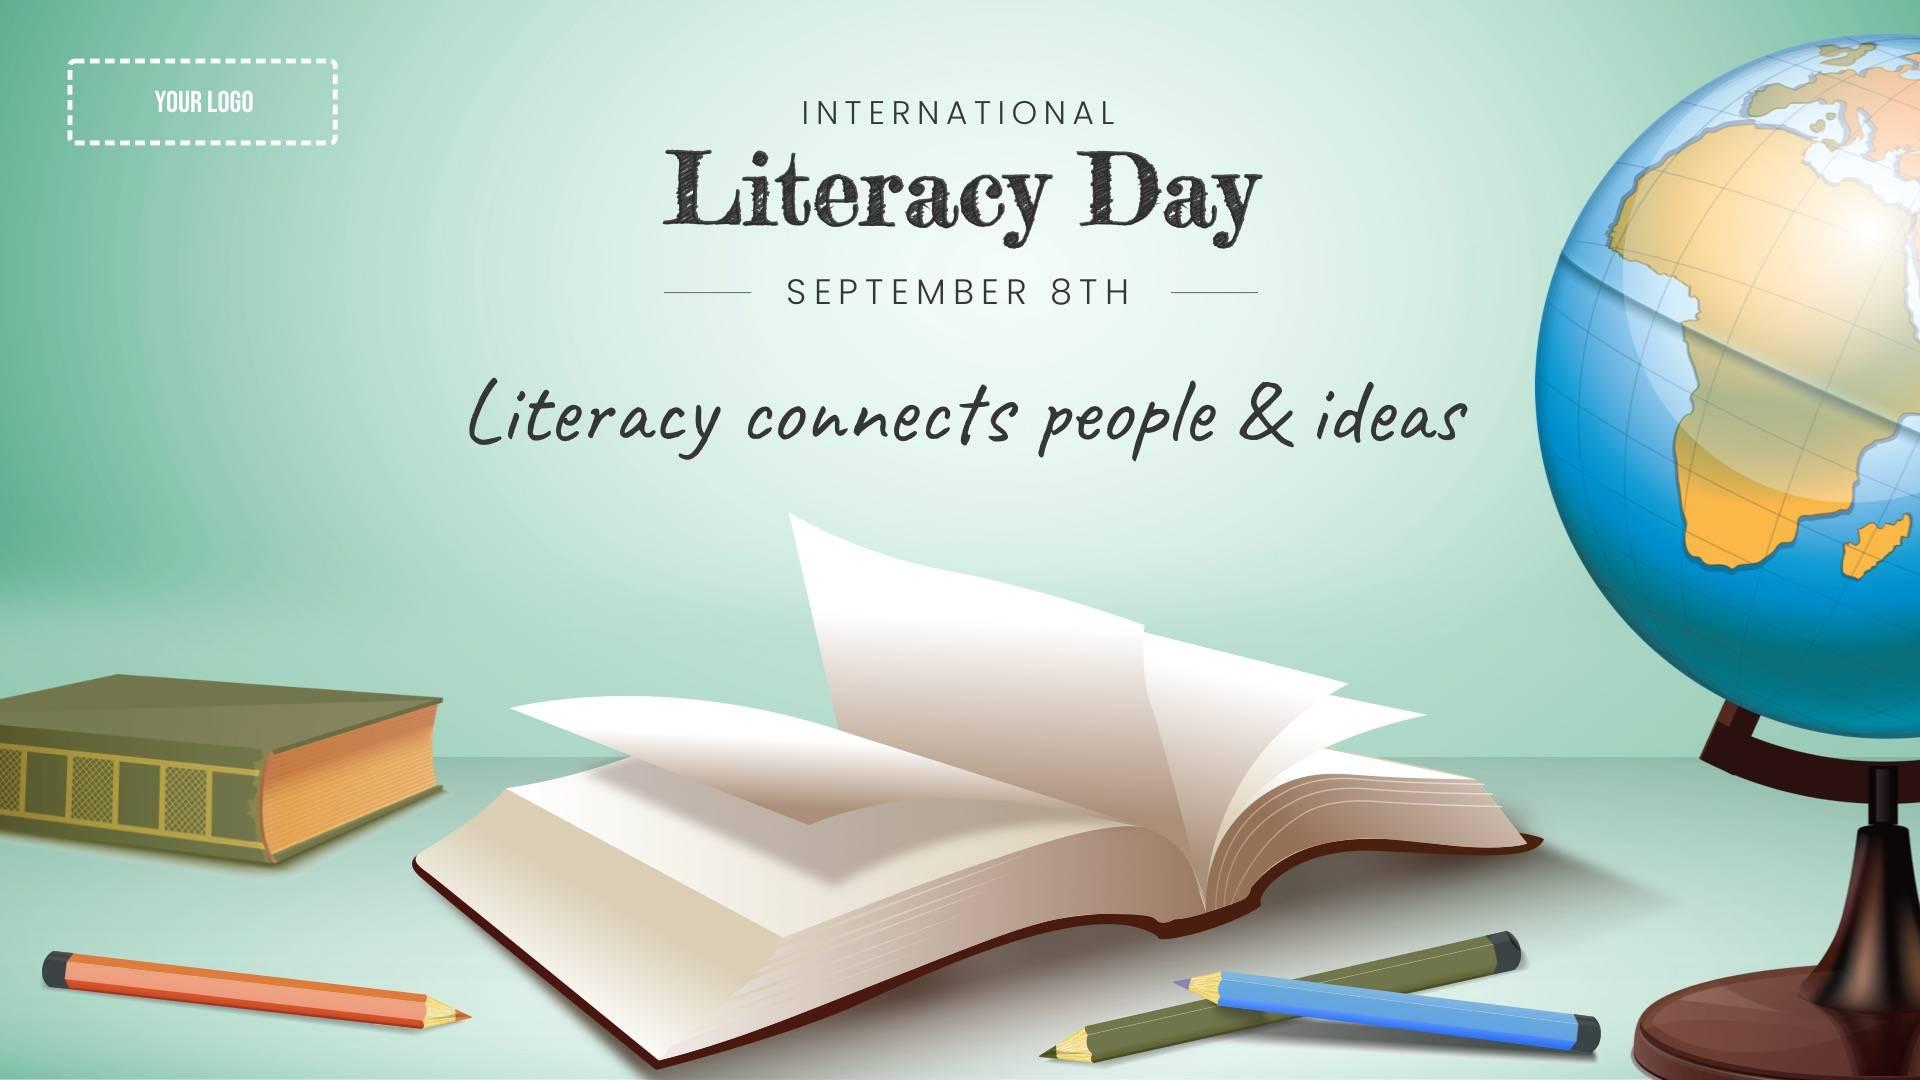 International Literacy Day Digital Signage Template